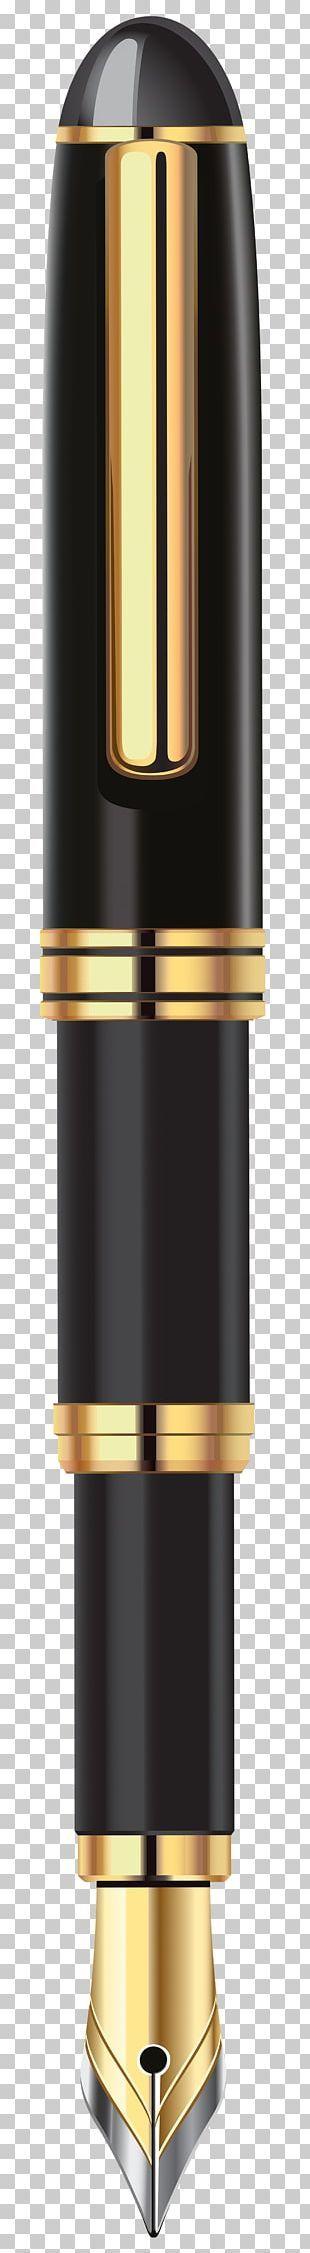 Paper Fountain Pen Nib Dip Pen Png Clipart Ballpoint Pen Cold Weapon Dip Pen Fountain Pen Gel Pen Free Png Download Fountain Pen Png Fountain